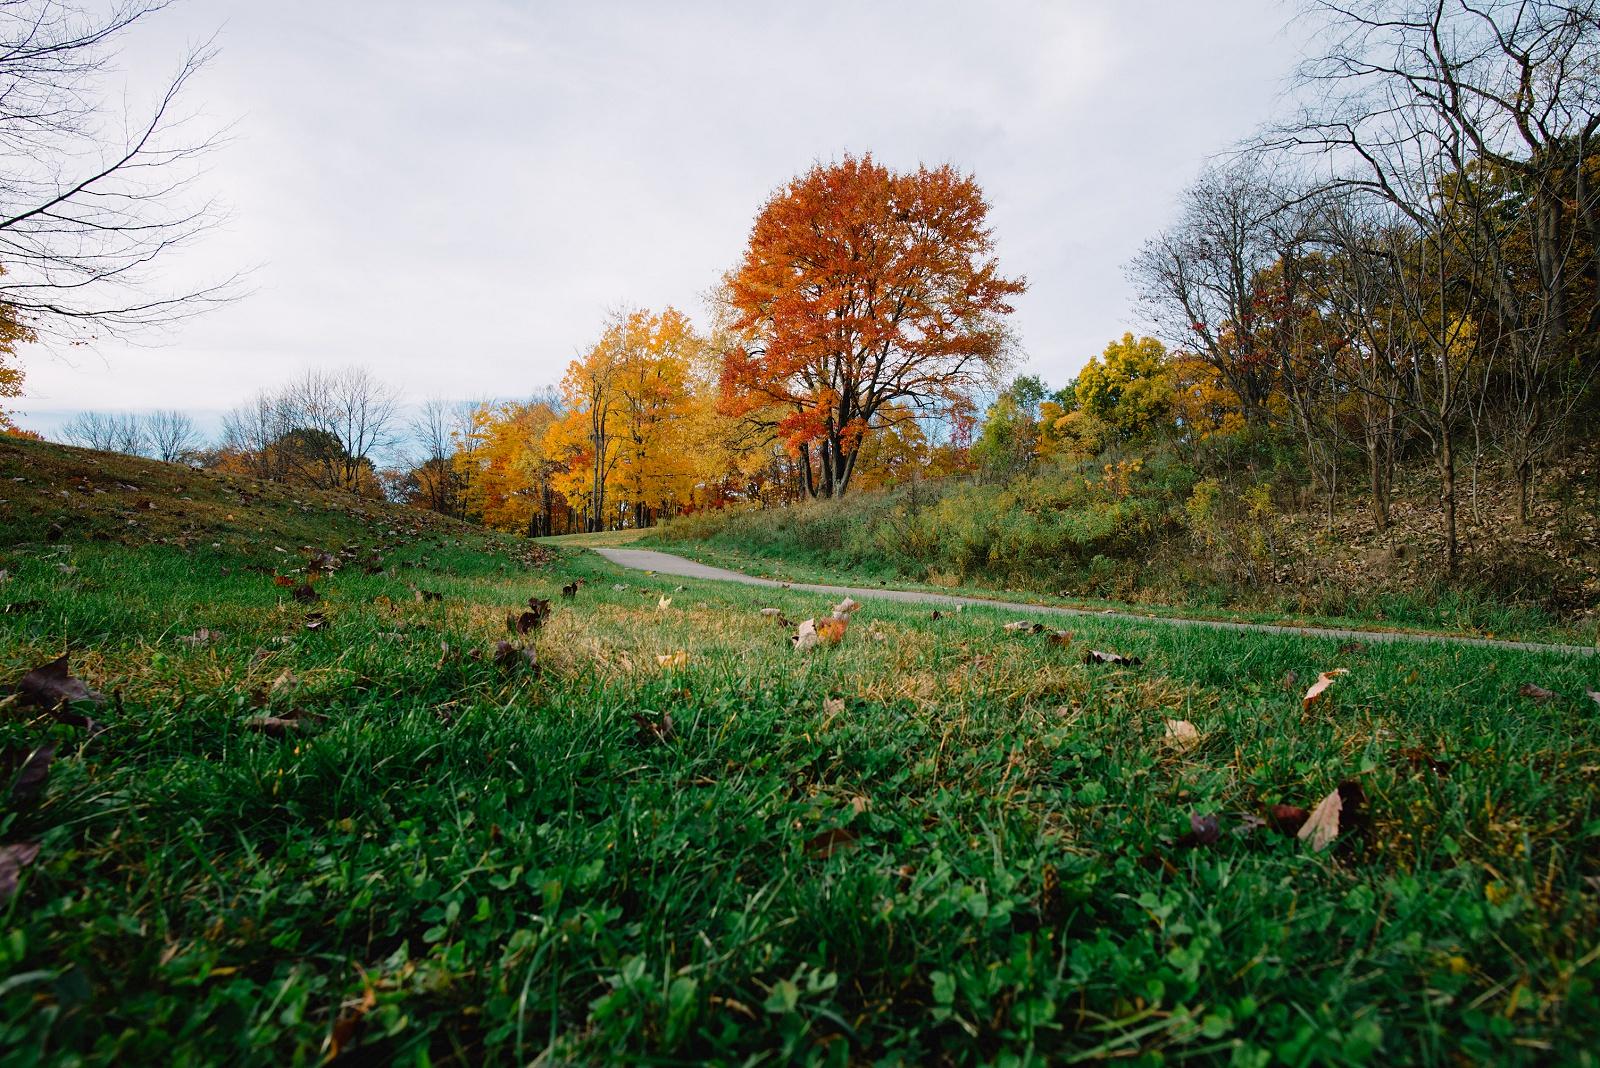 Sandrachile | Pittsburgh photographer